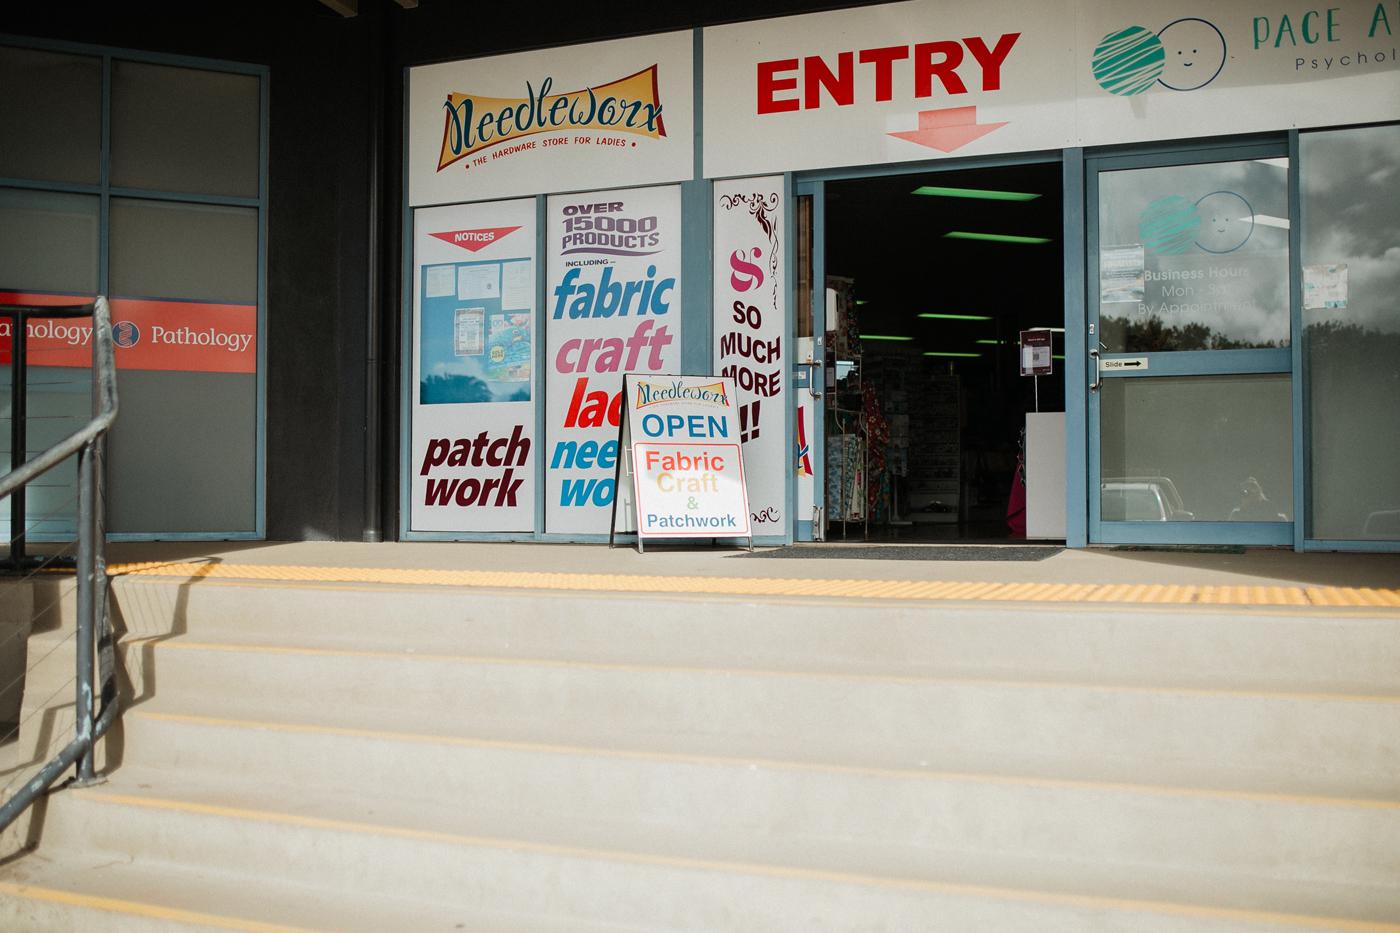 Entrance to Needleworx Mount Pleasant